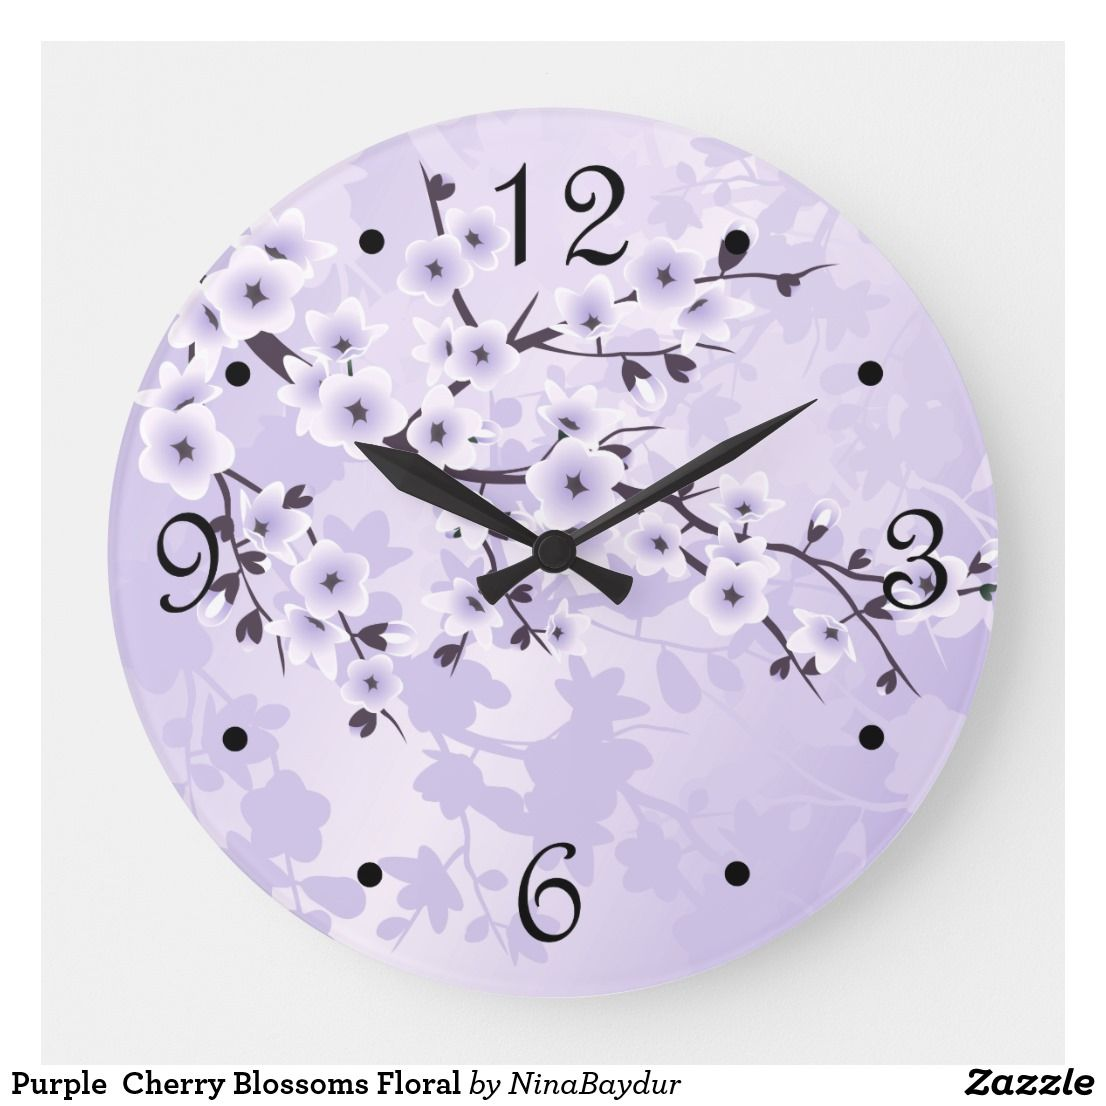 Einzel-schlafzimmer-wohndesign purple cherry blossoms floral large clock in   wall clocks